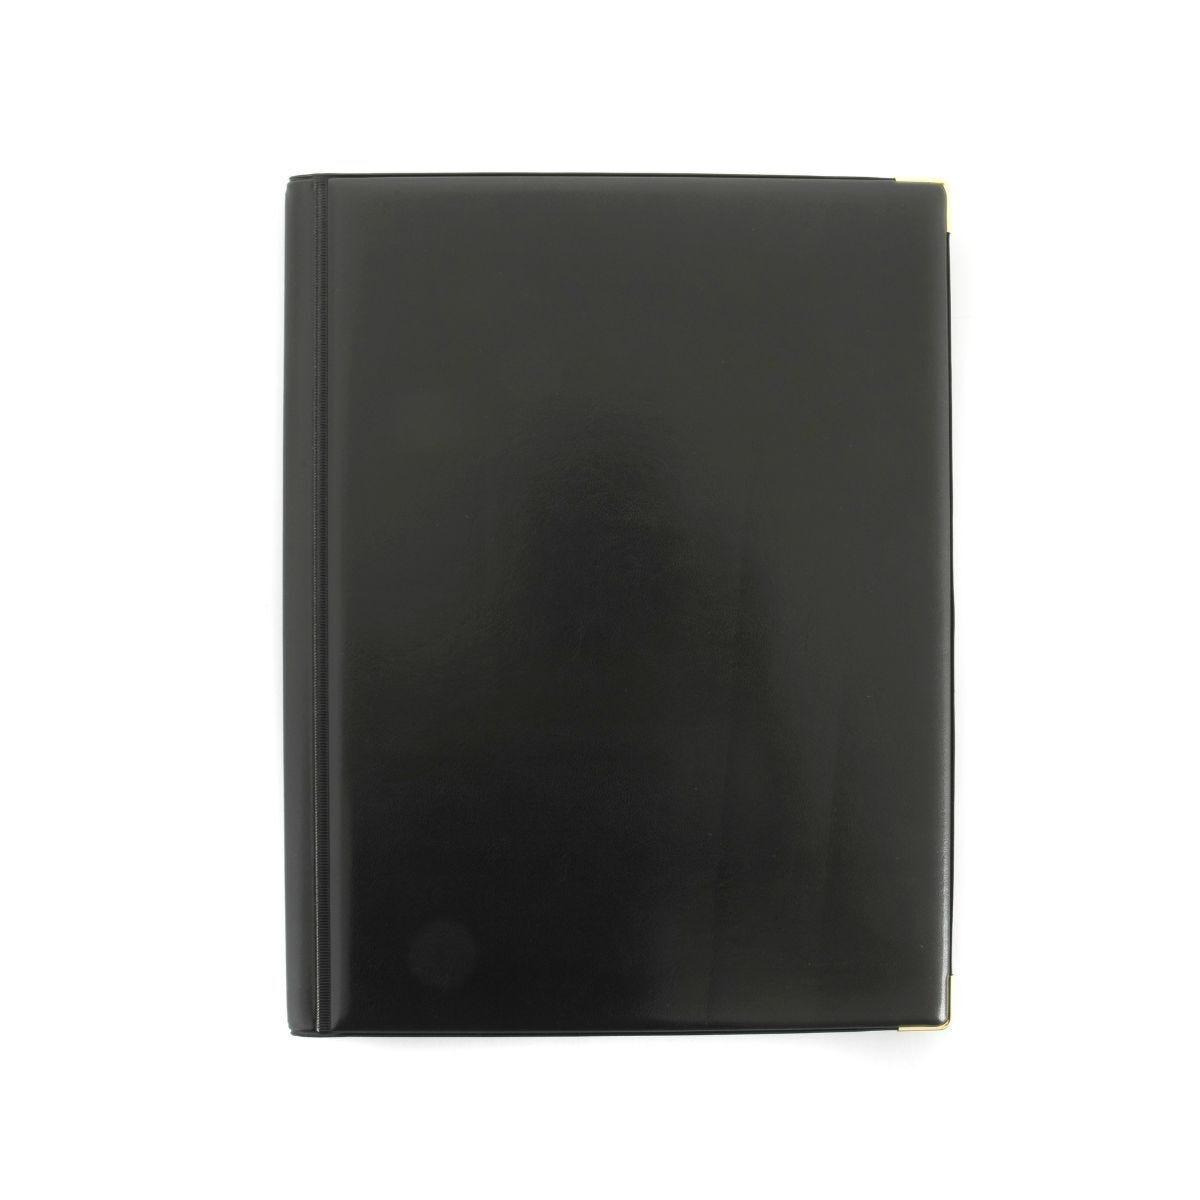 Ryman Deluxe Display Book A4 12 Pockets Black